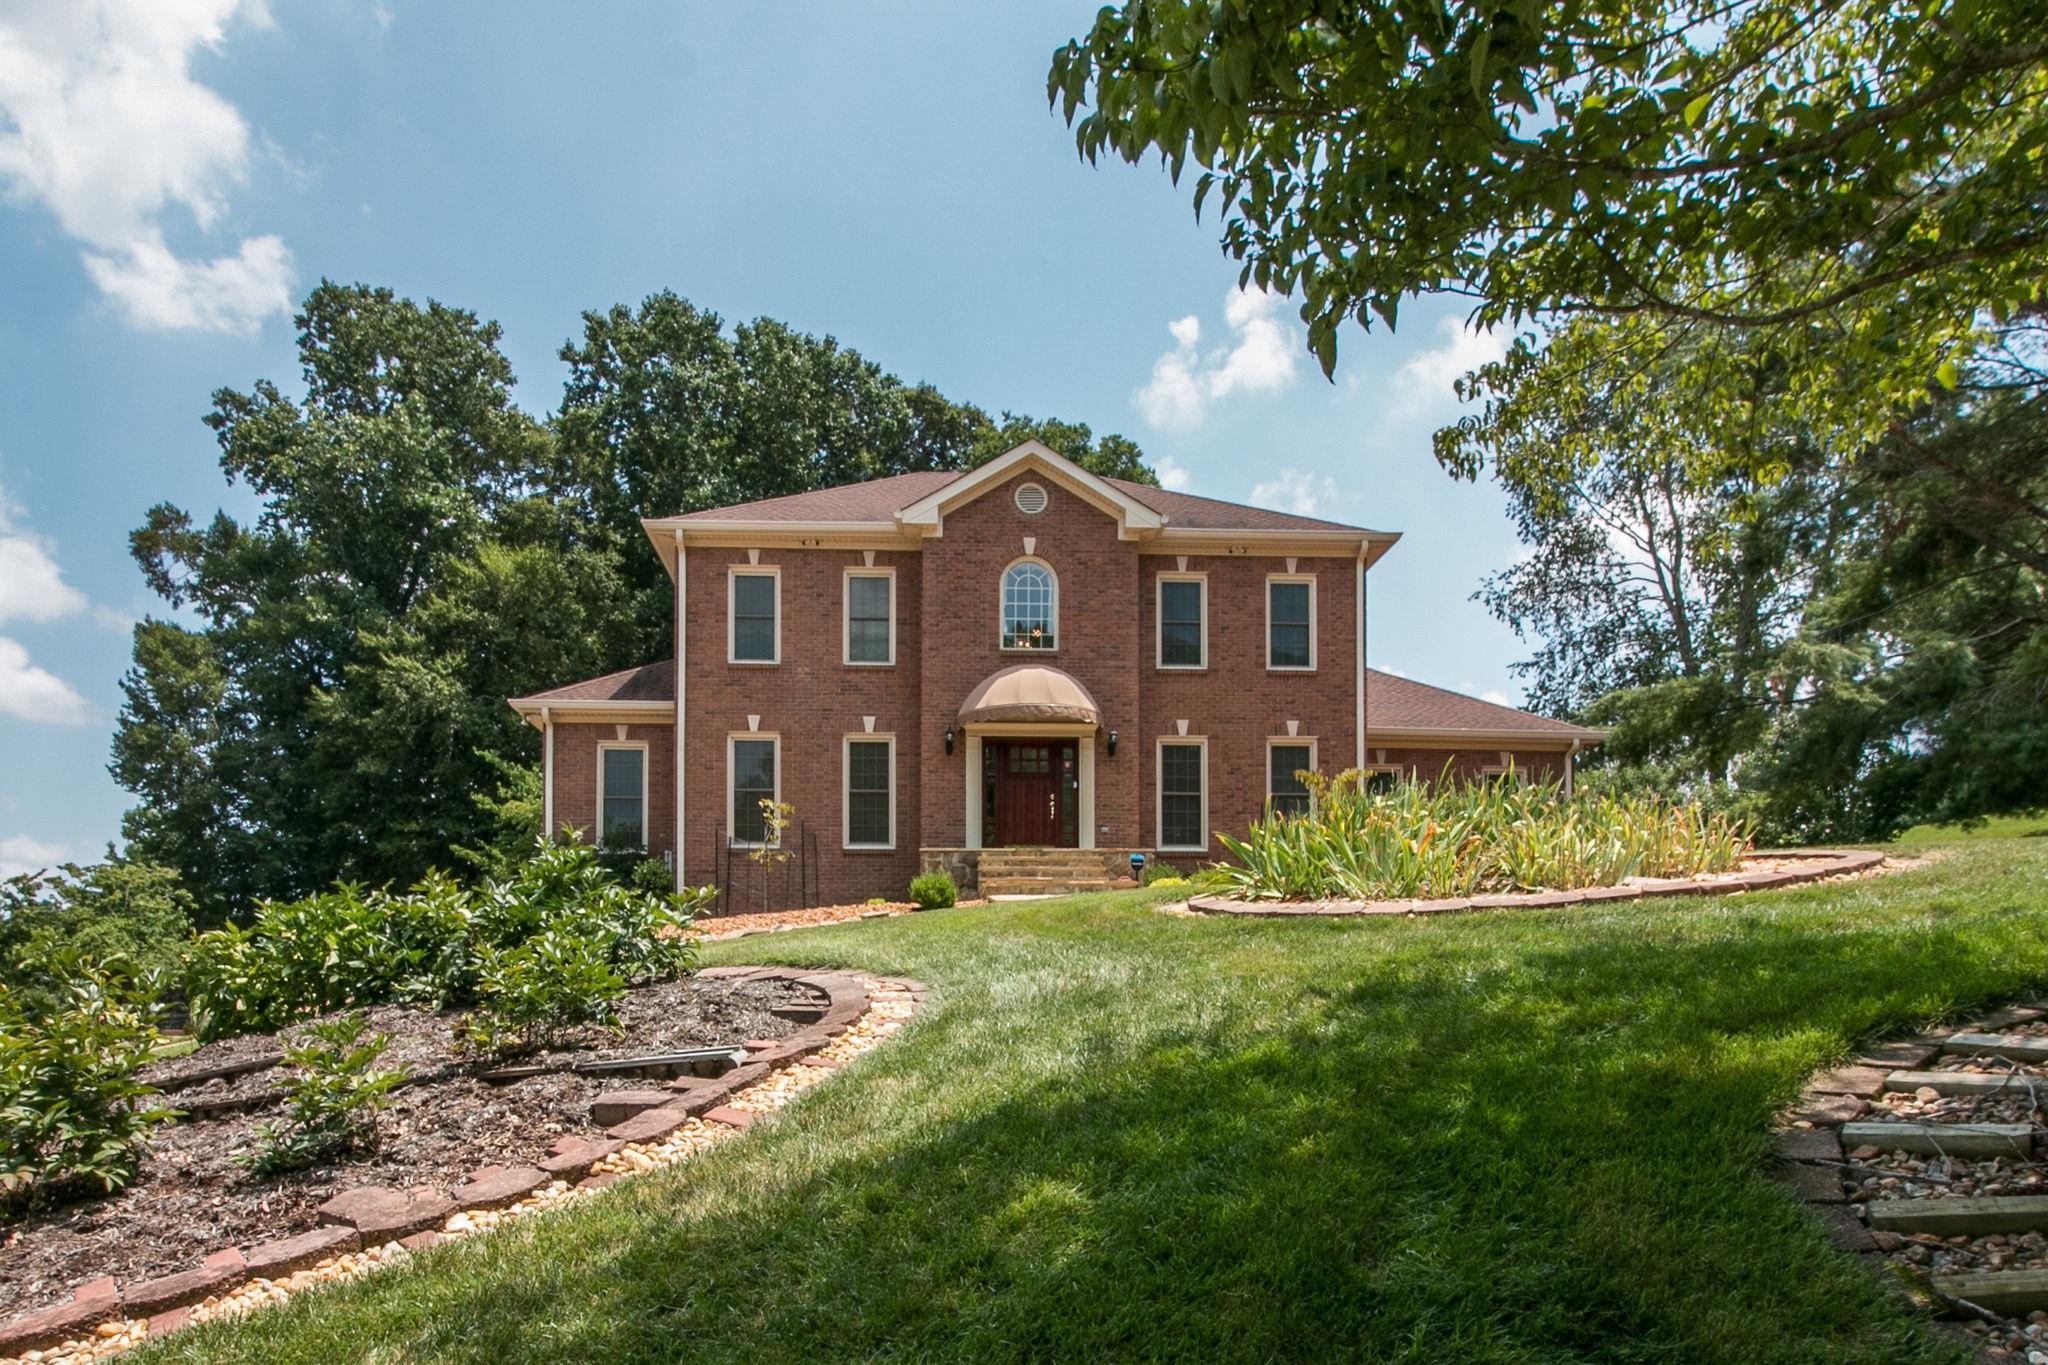 435 Stonemeadow Rd, Clarksville, TN 37043 - Clarksville, TN real estate listing